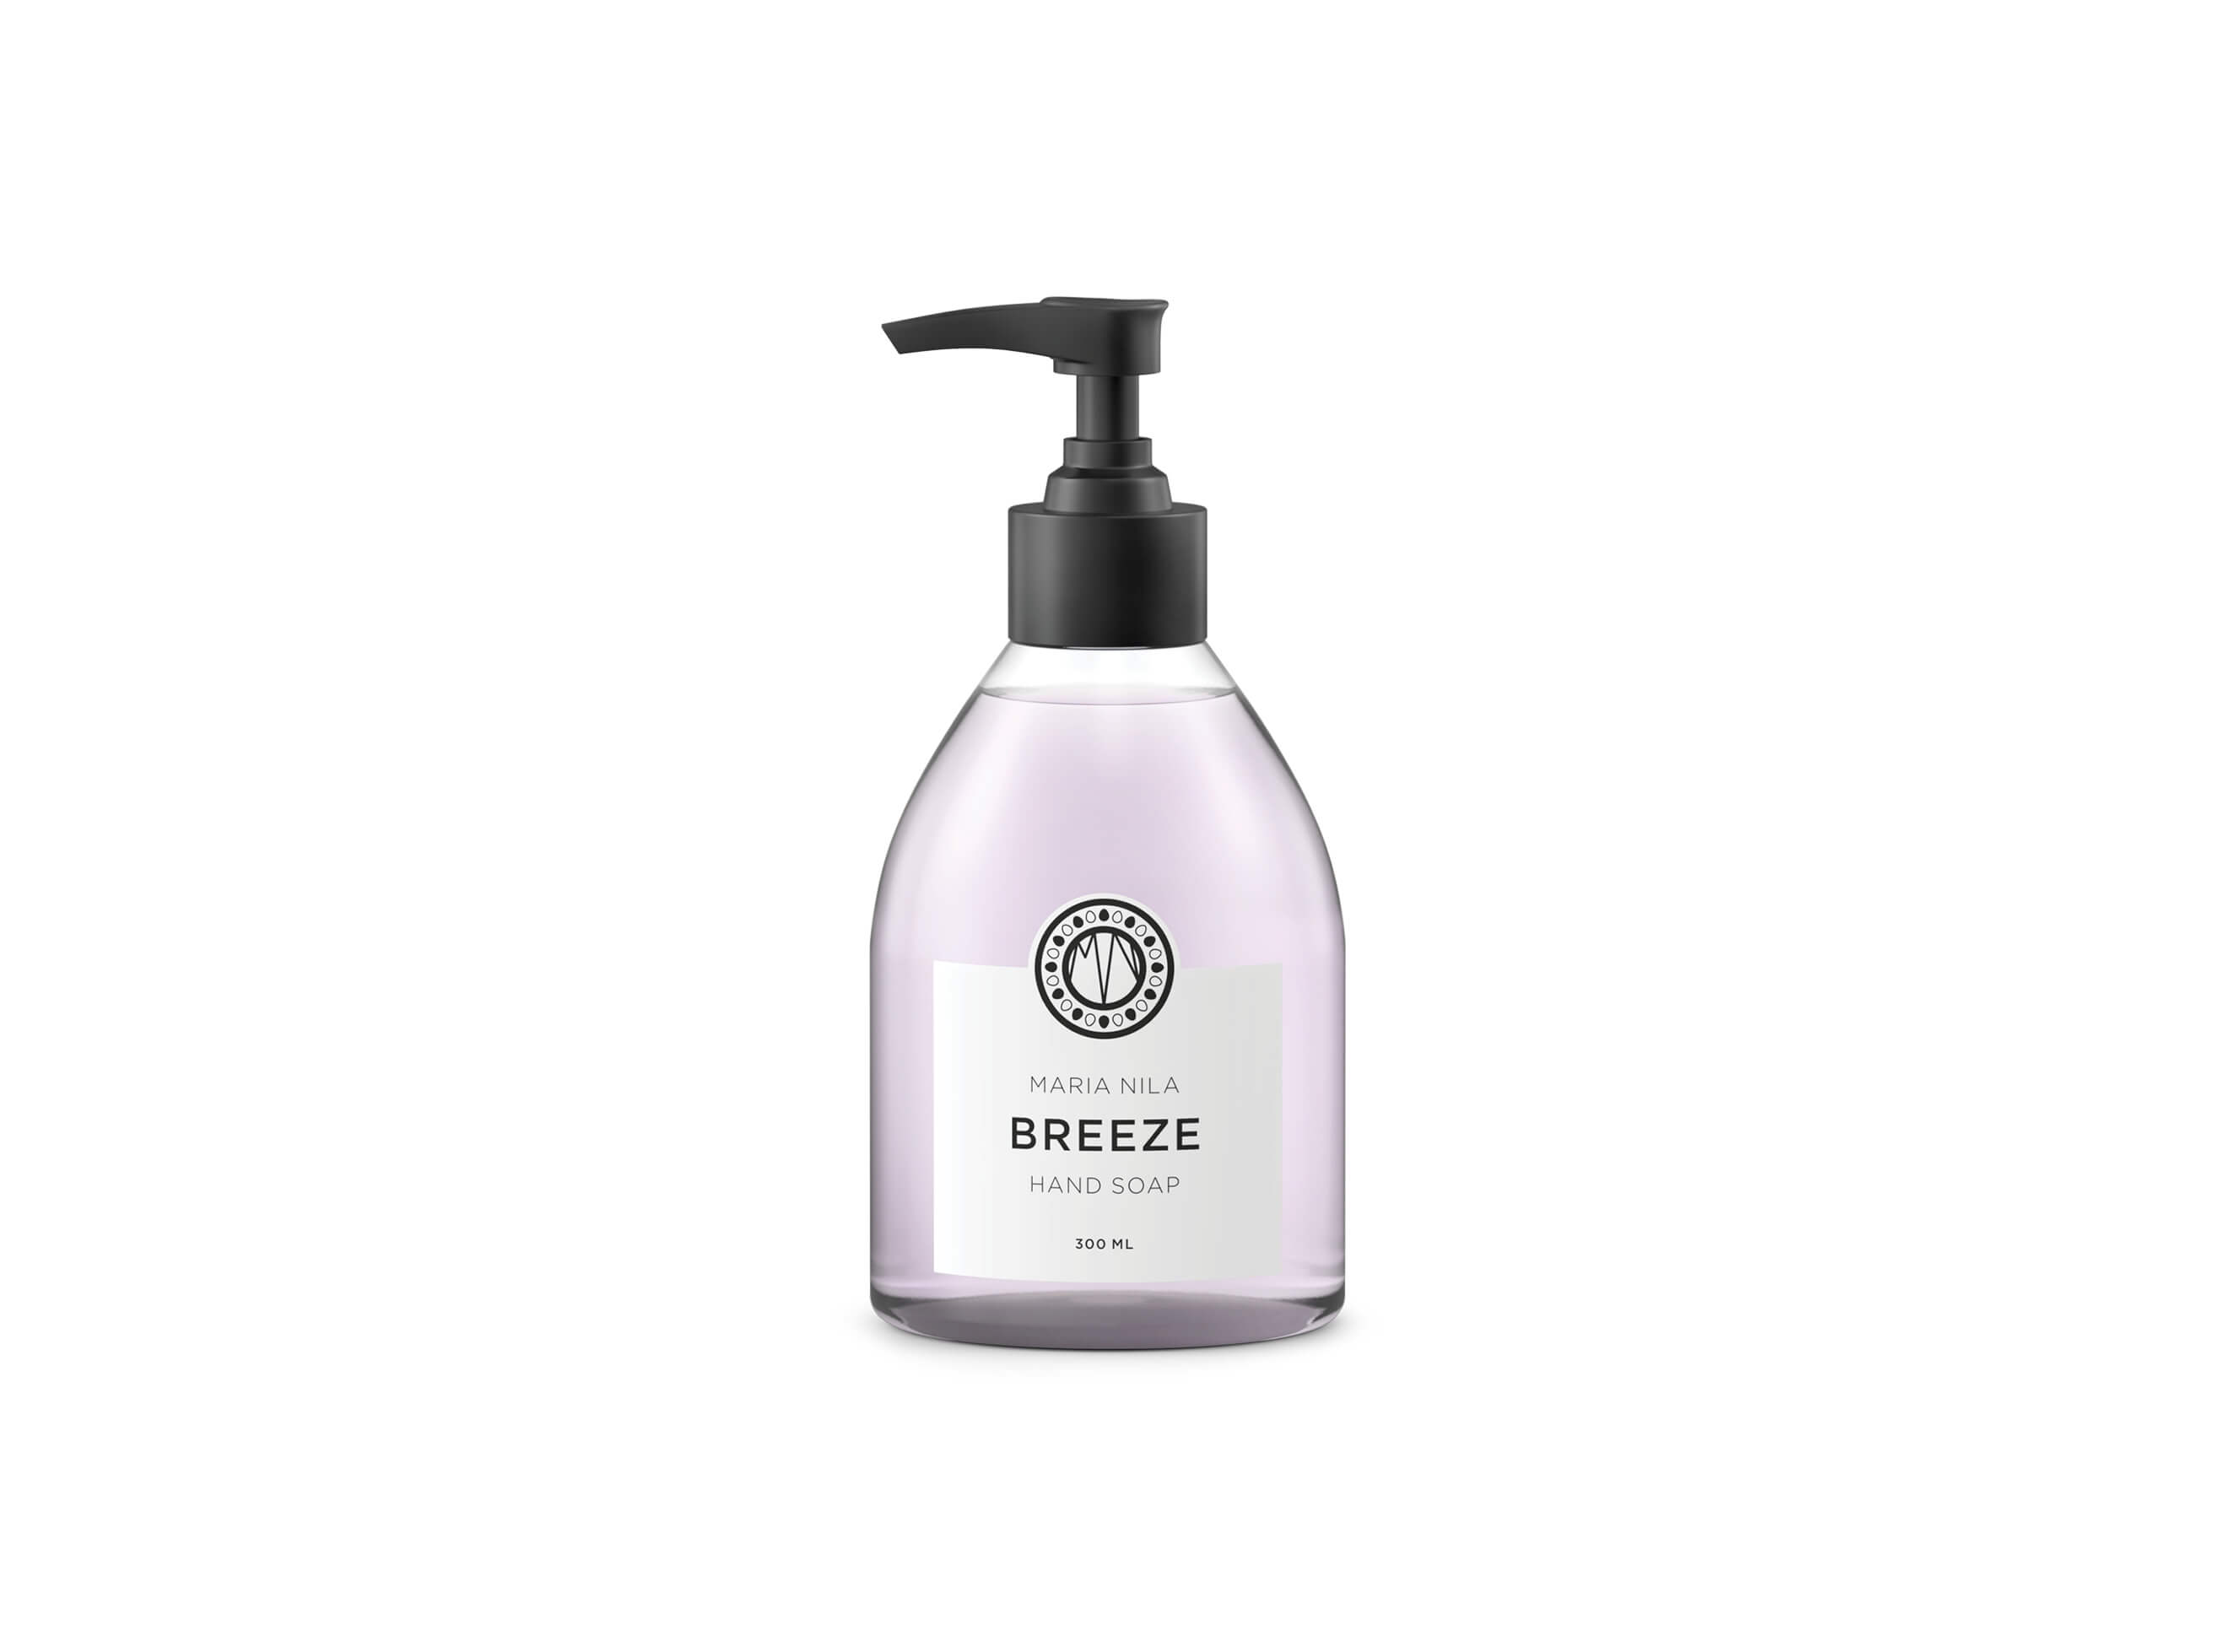 Maria Nila Breeze Hand Soap, 300 ml